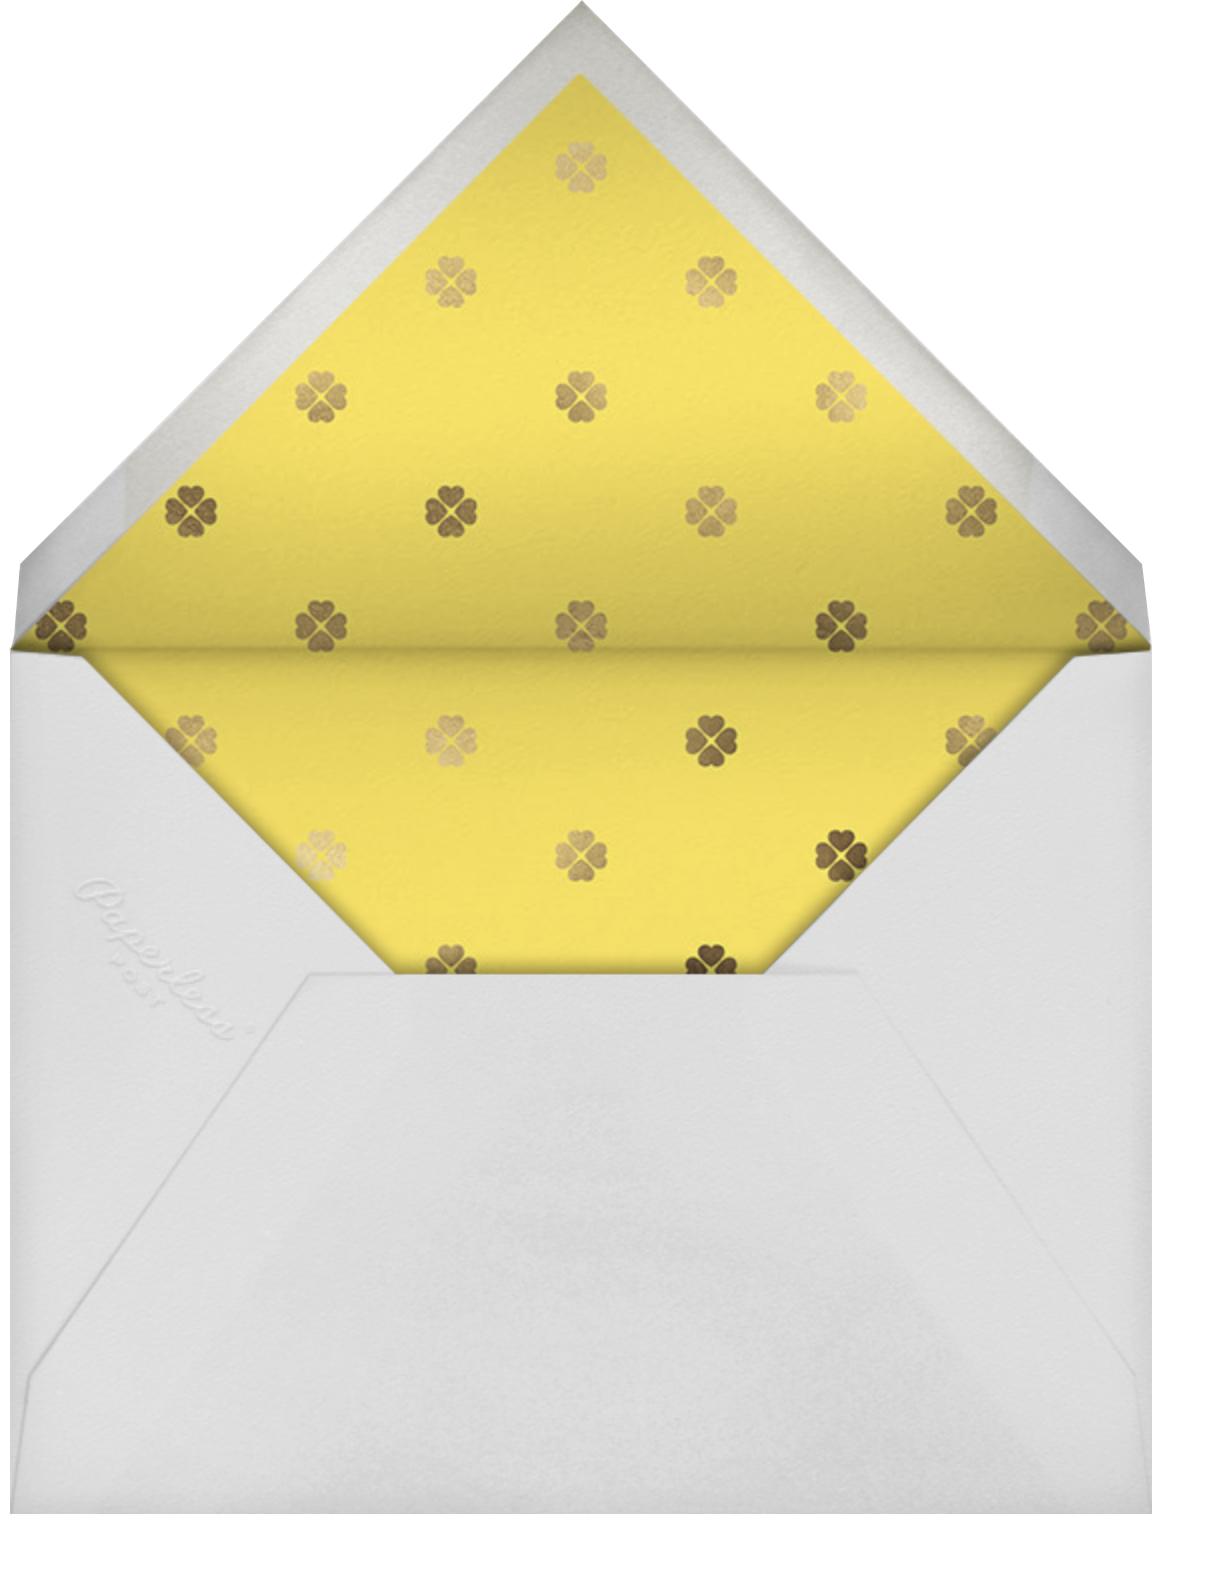 Colorblocked Border - Yellow/Pavlova - kate spade new york - Easter - envelope back